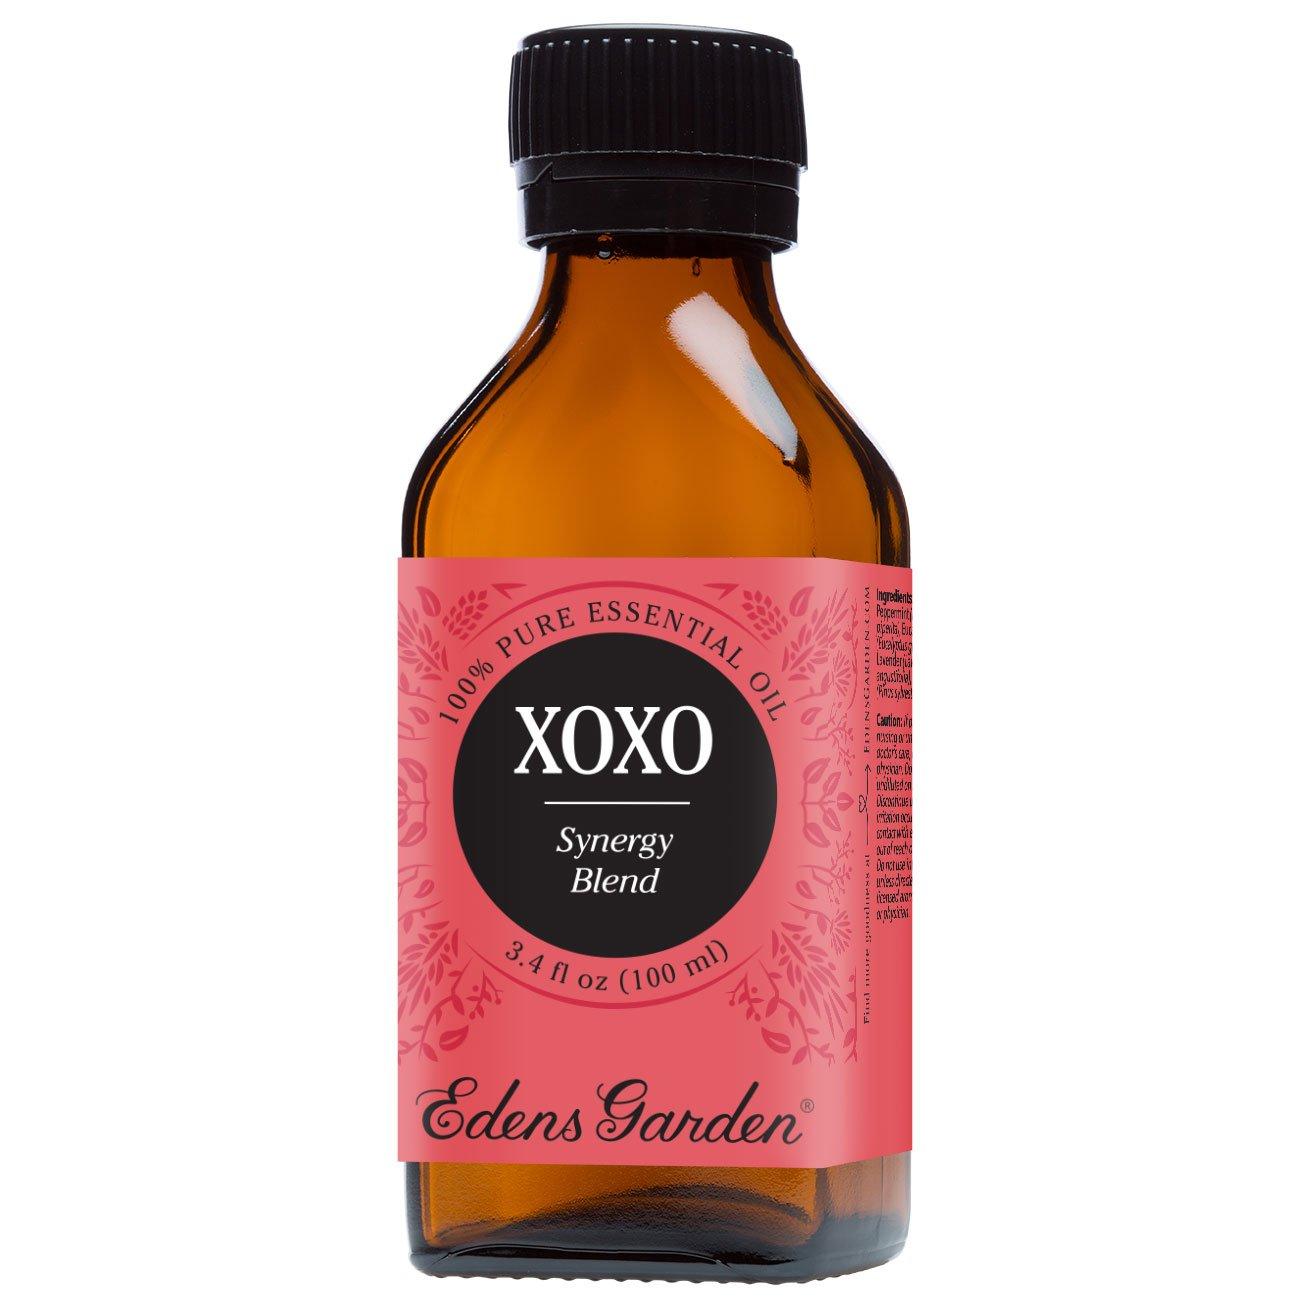 XOXO Synergy Blend Essential Oil by Edens Garden 100 ml